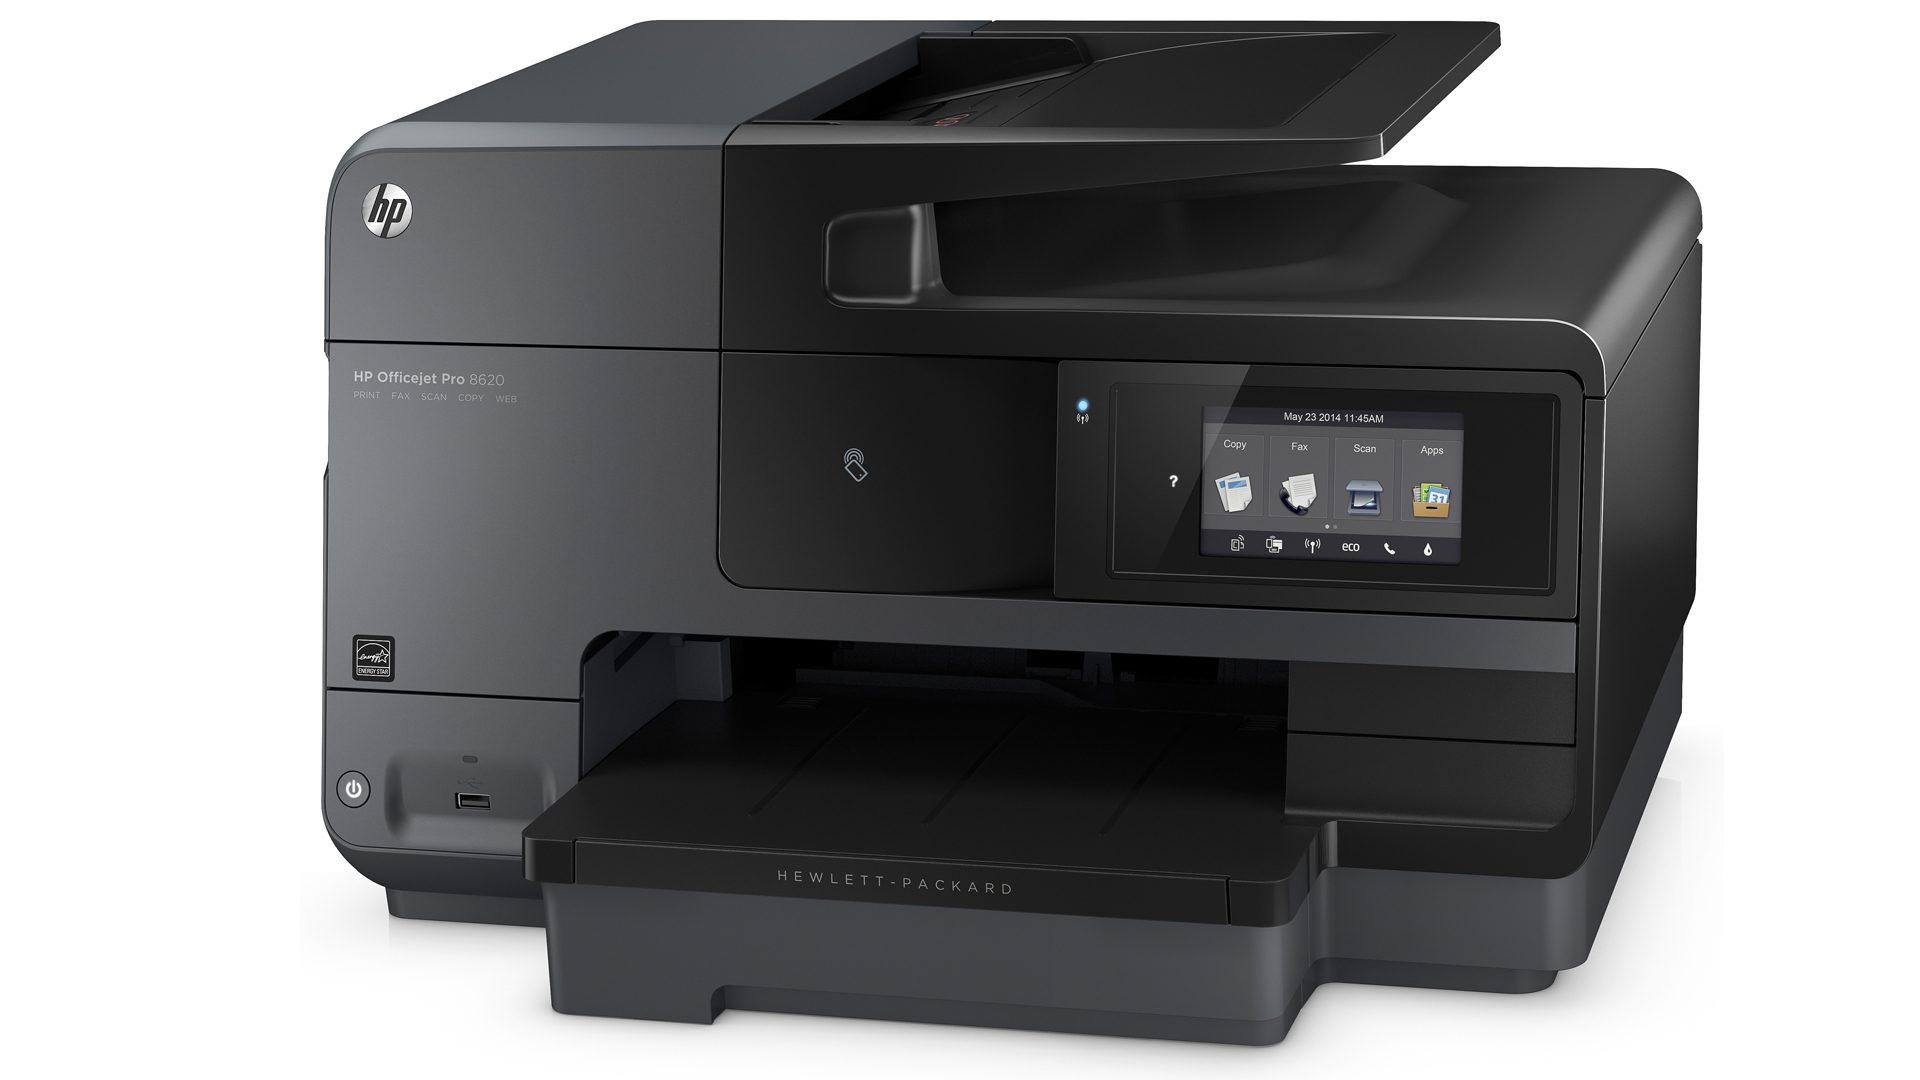 HP-Officejet-Pro-8620—Anischten-2